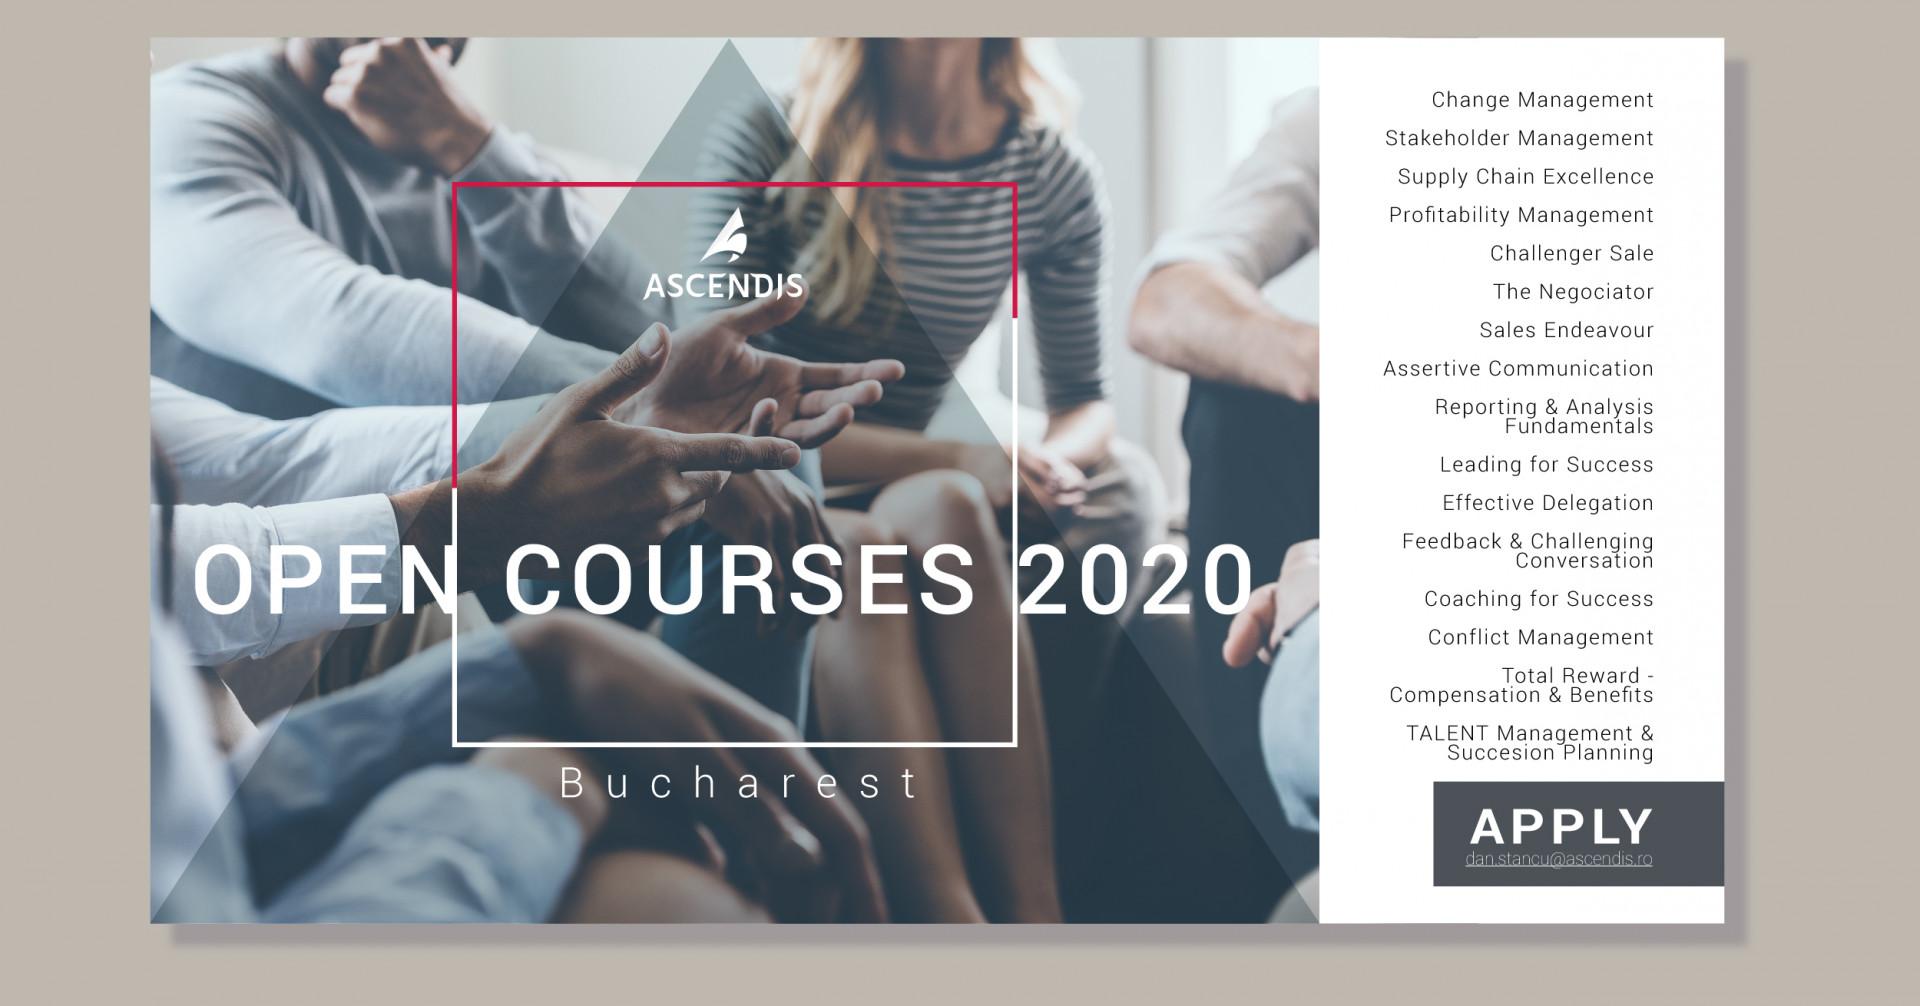 Agenda cursurilor deschise - primavara 2020